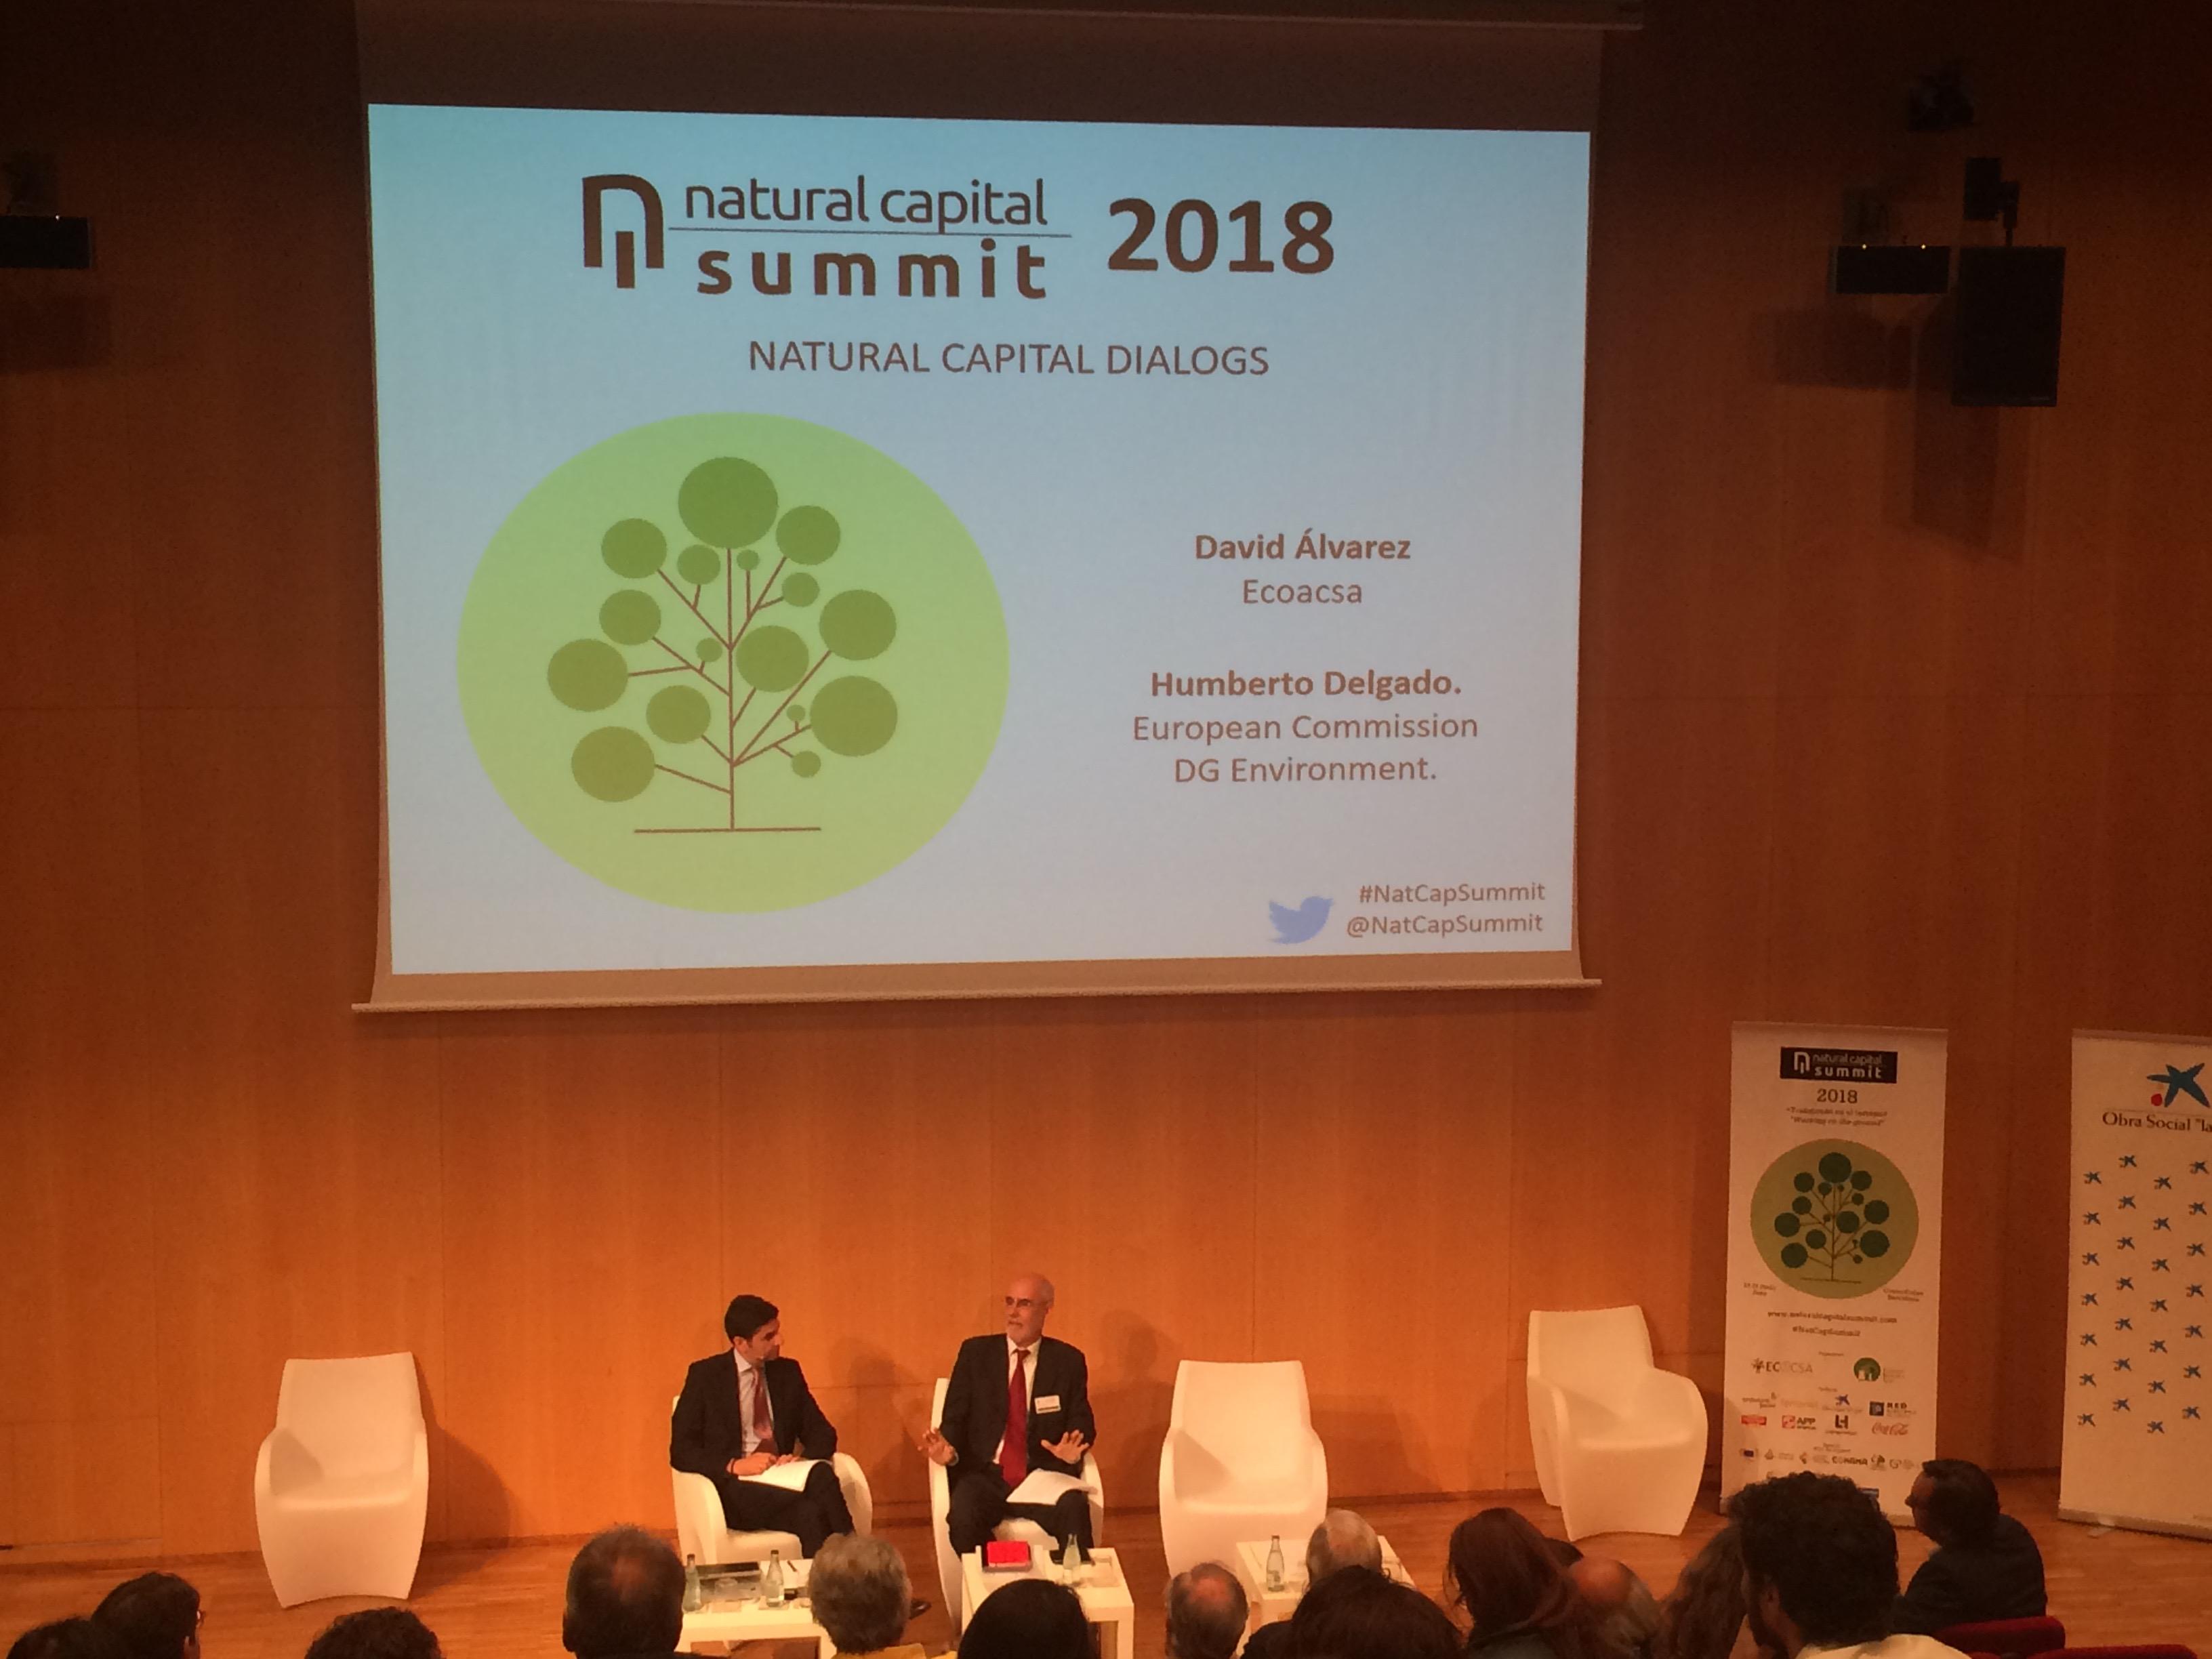 Natural capital dialogues with Humberto Delgado, Natural Capital Director, DG Environment of the European Commission